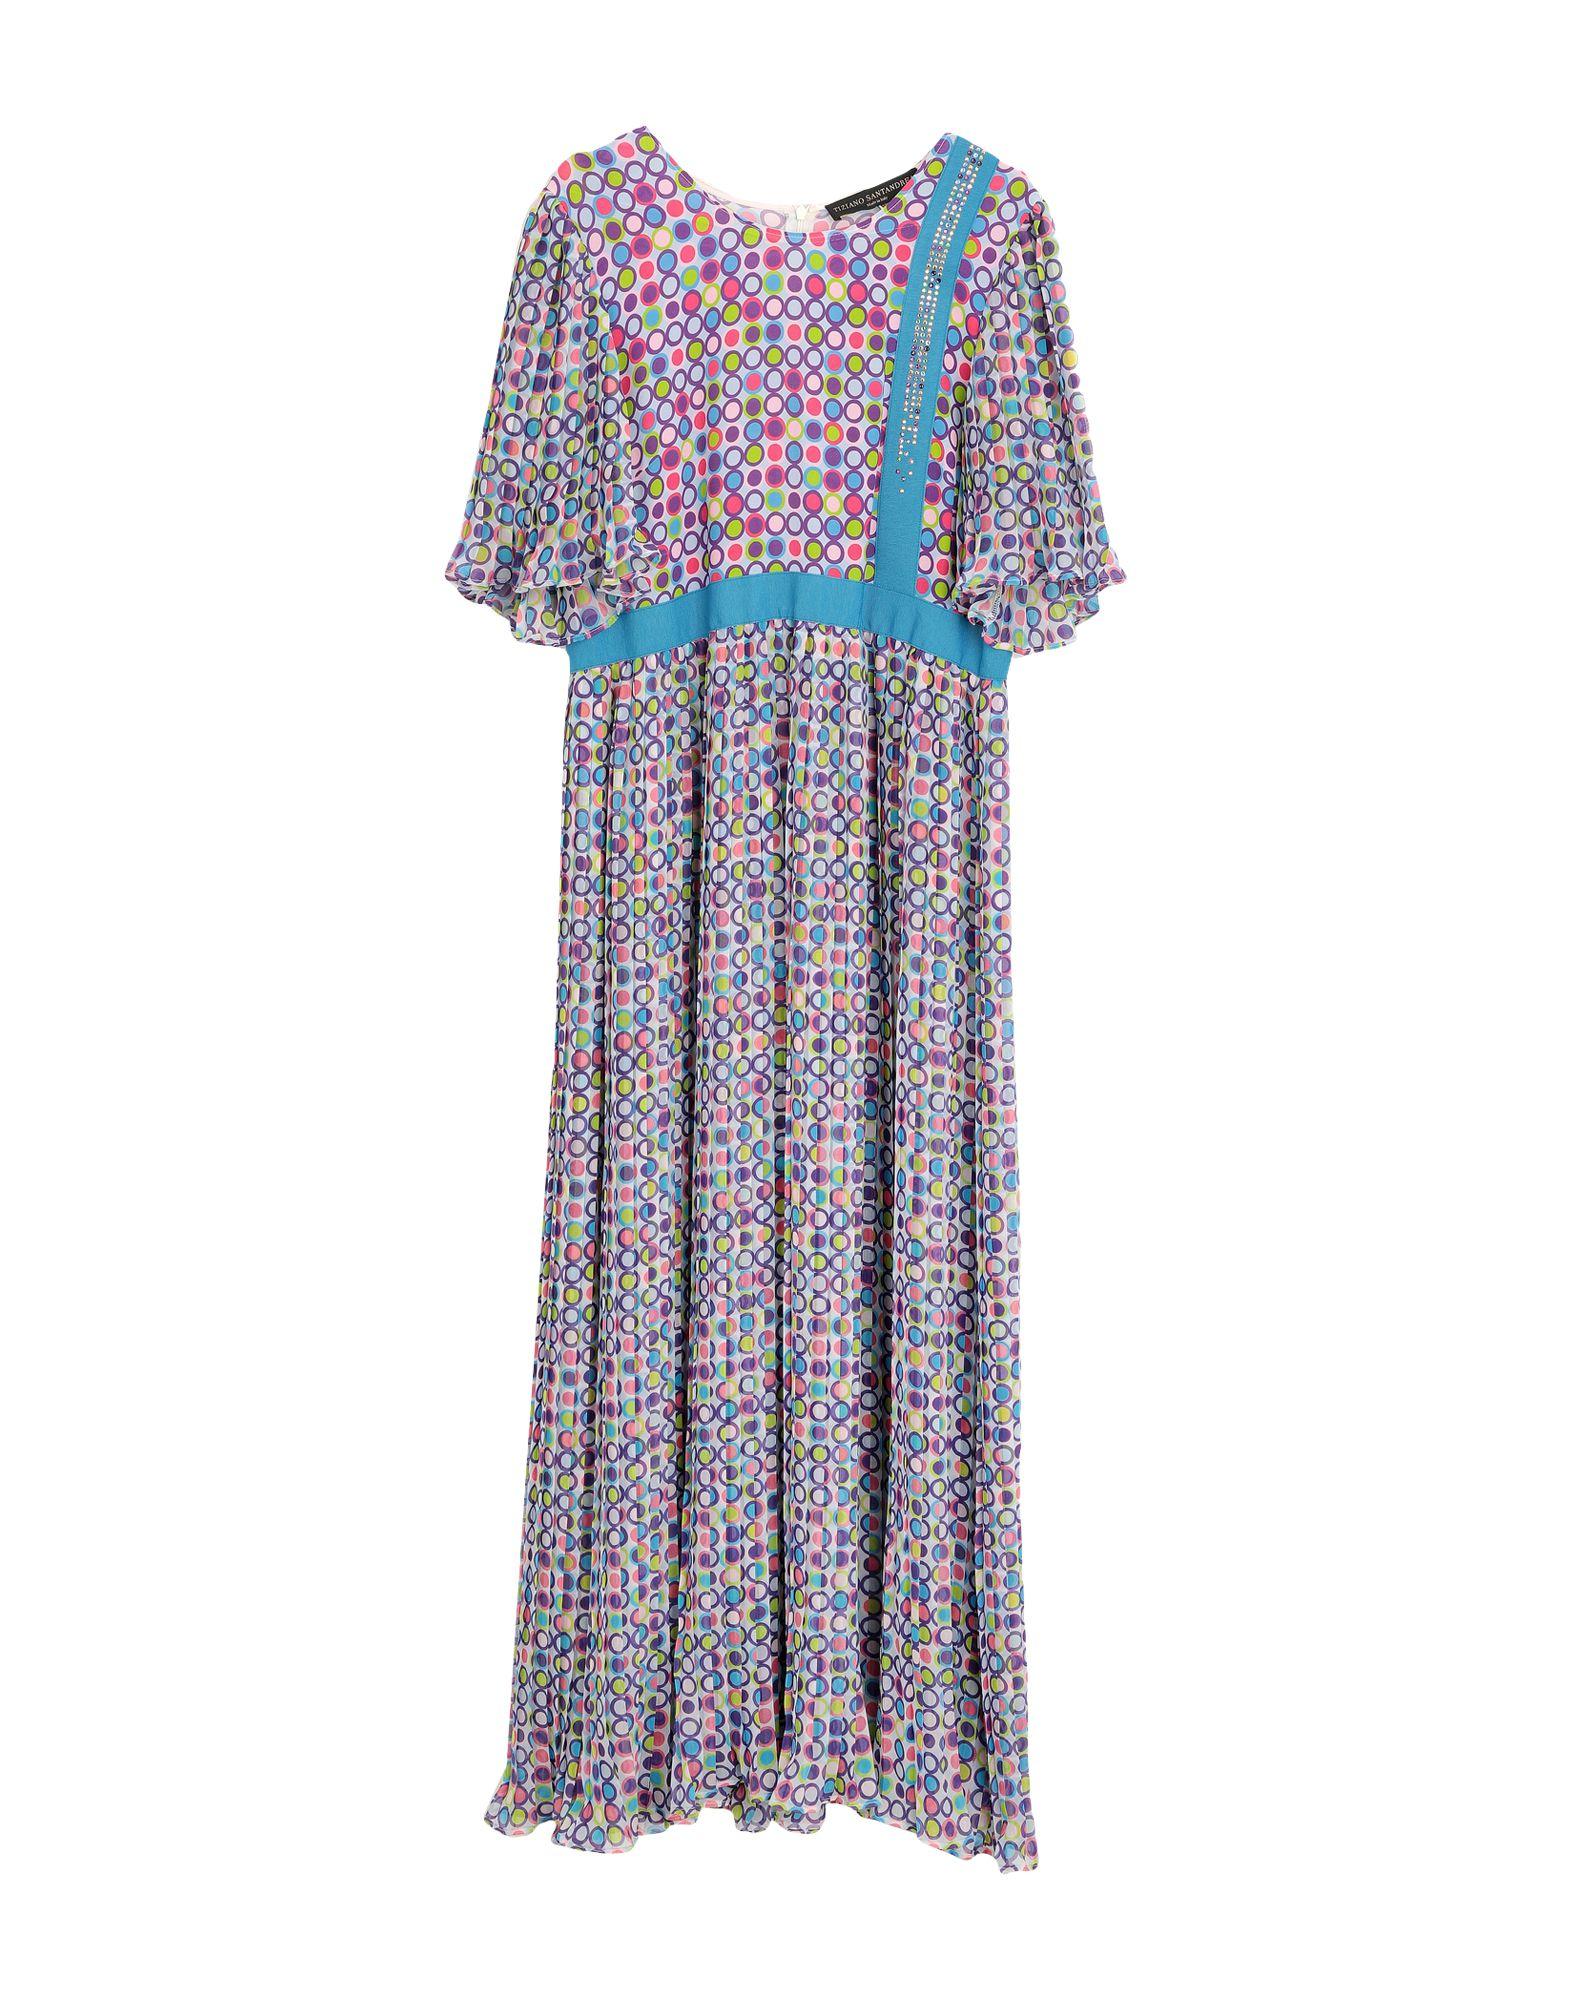 TIZIANO SANTANDREA Длинное платье